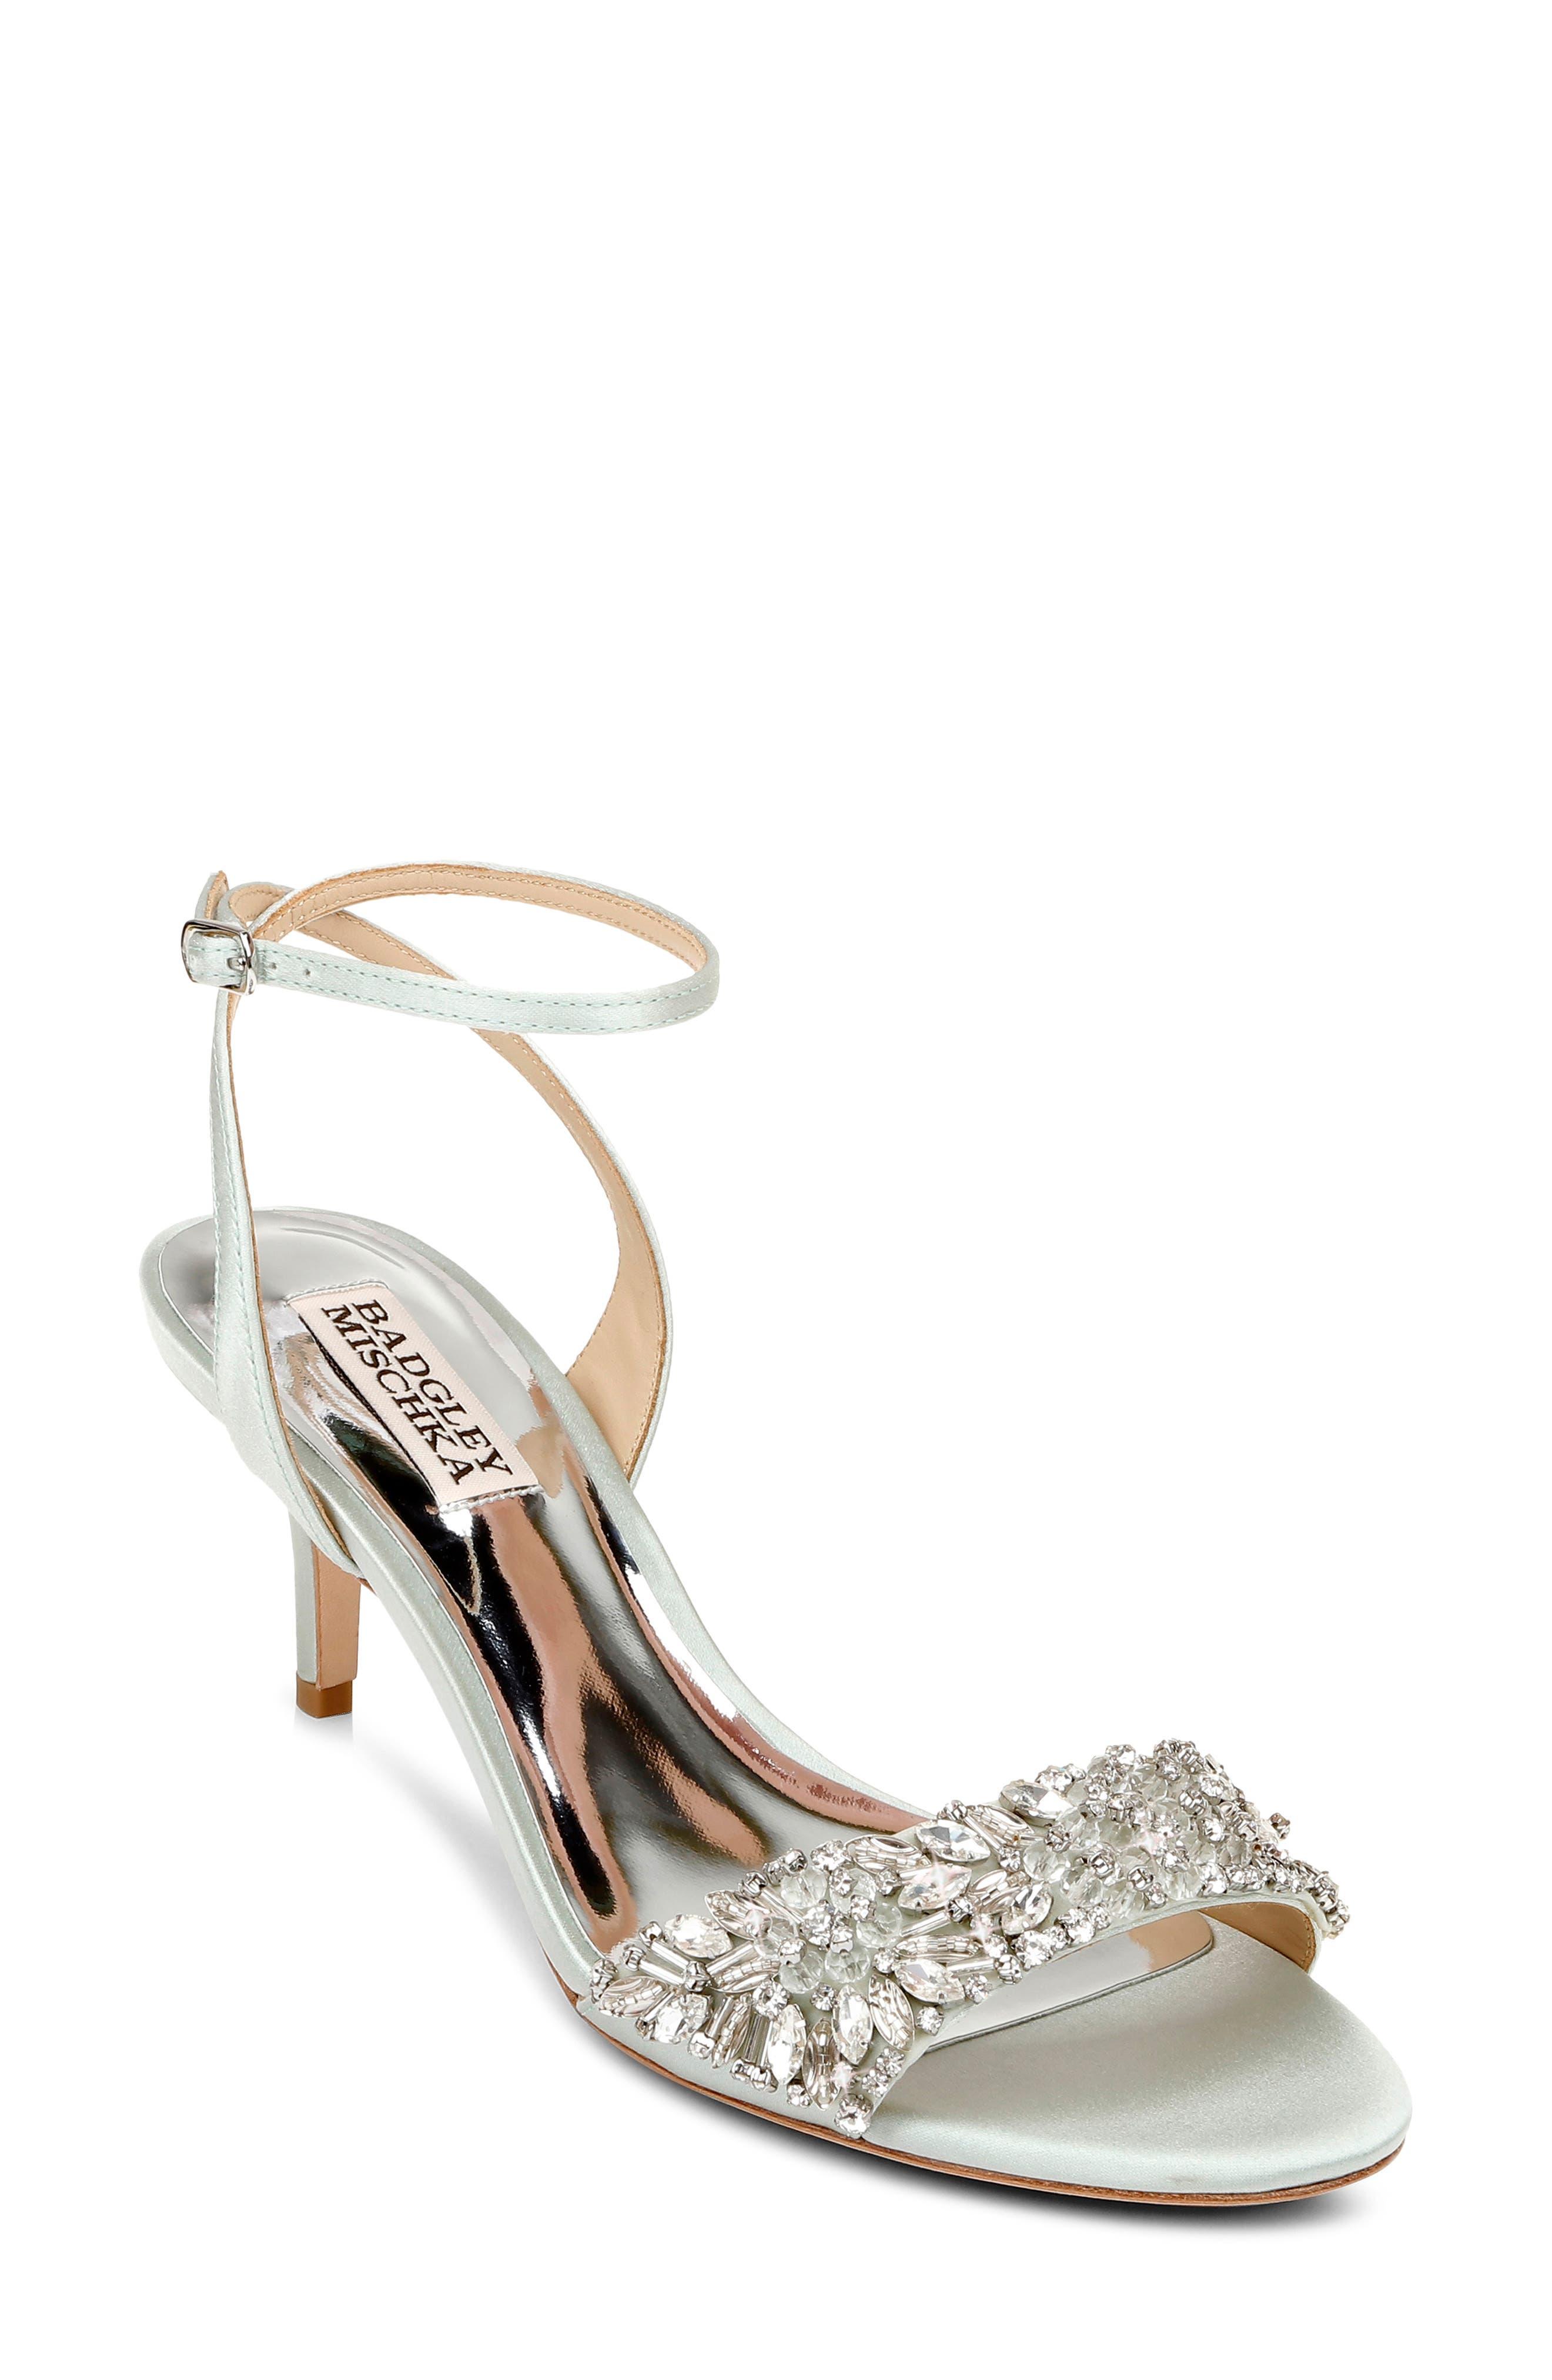 Women's Badgley Mischka Richelle Embellished Ankle Strap Sandal